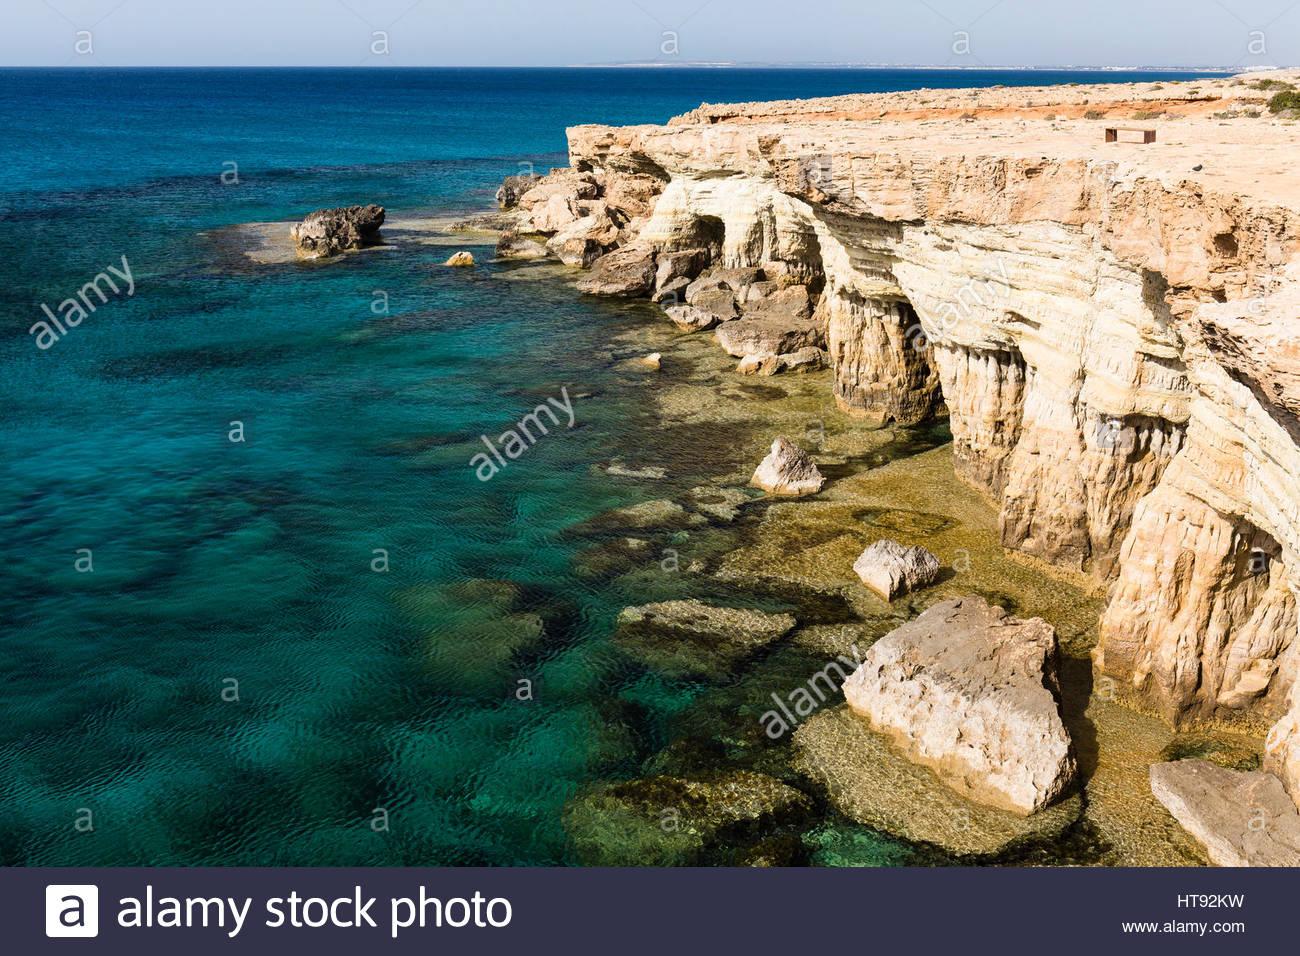 Meeresgrotten entlang der felsigen Küste von Mittelmeer, Kap Greco, National Forest Park, Ayia Napa, Zypern Stockbild